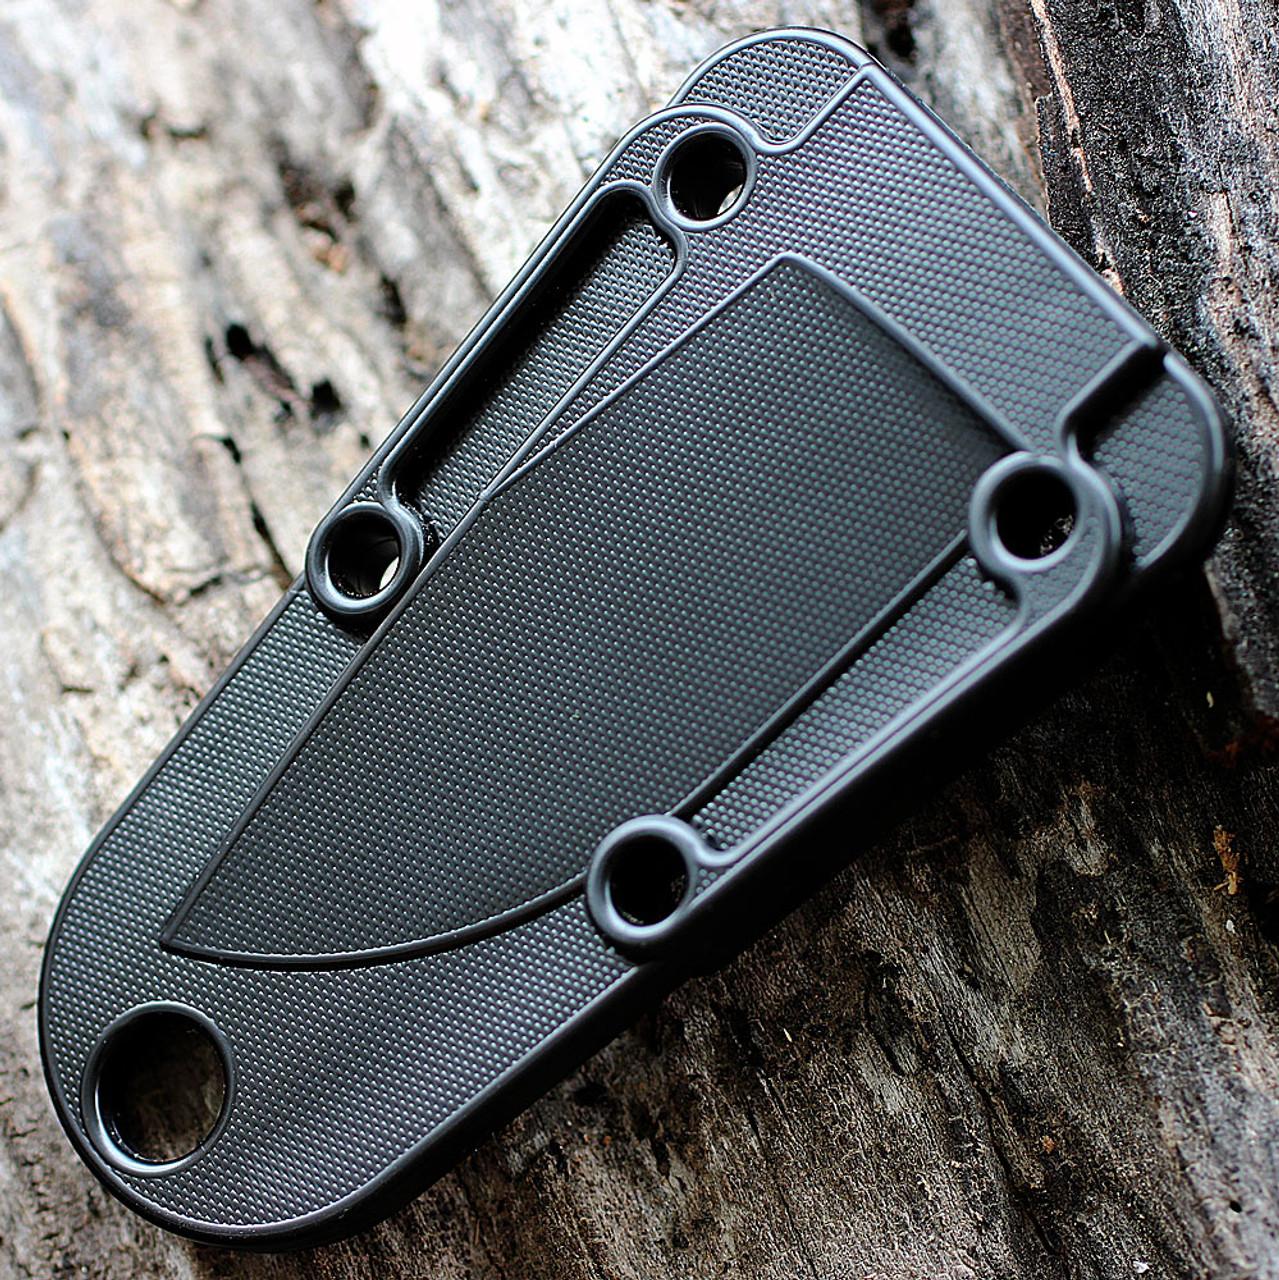 ESEE Izula II Tactical Gray Knife, Molded Sheath and Clip Plate